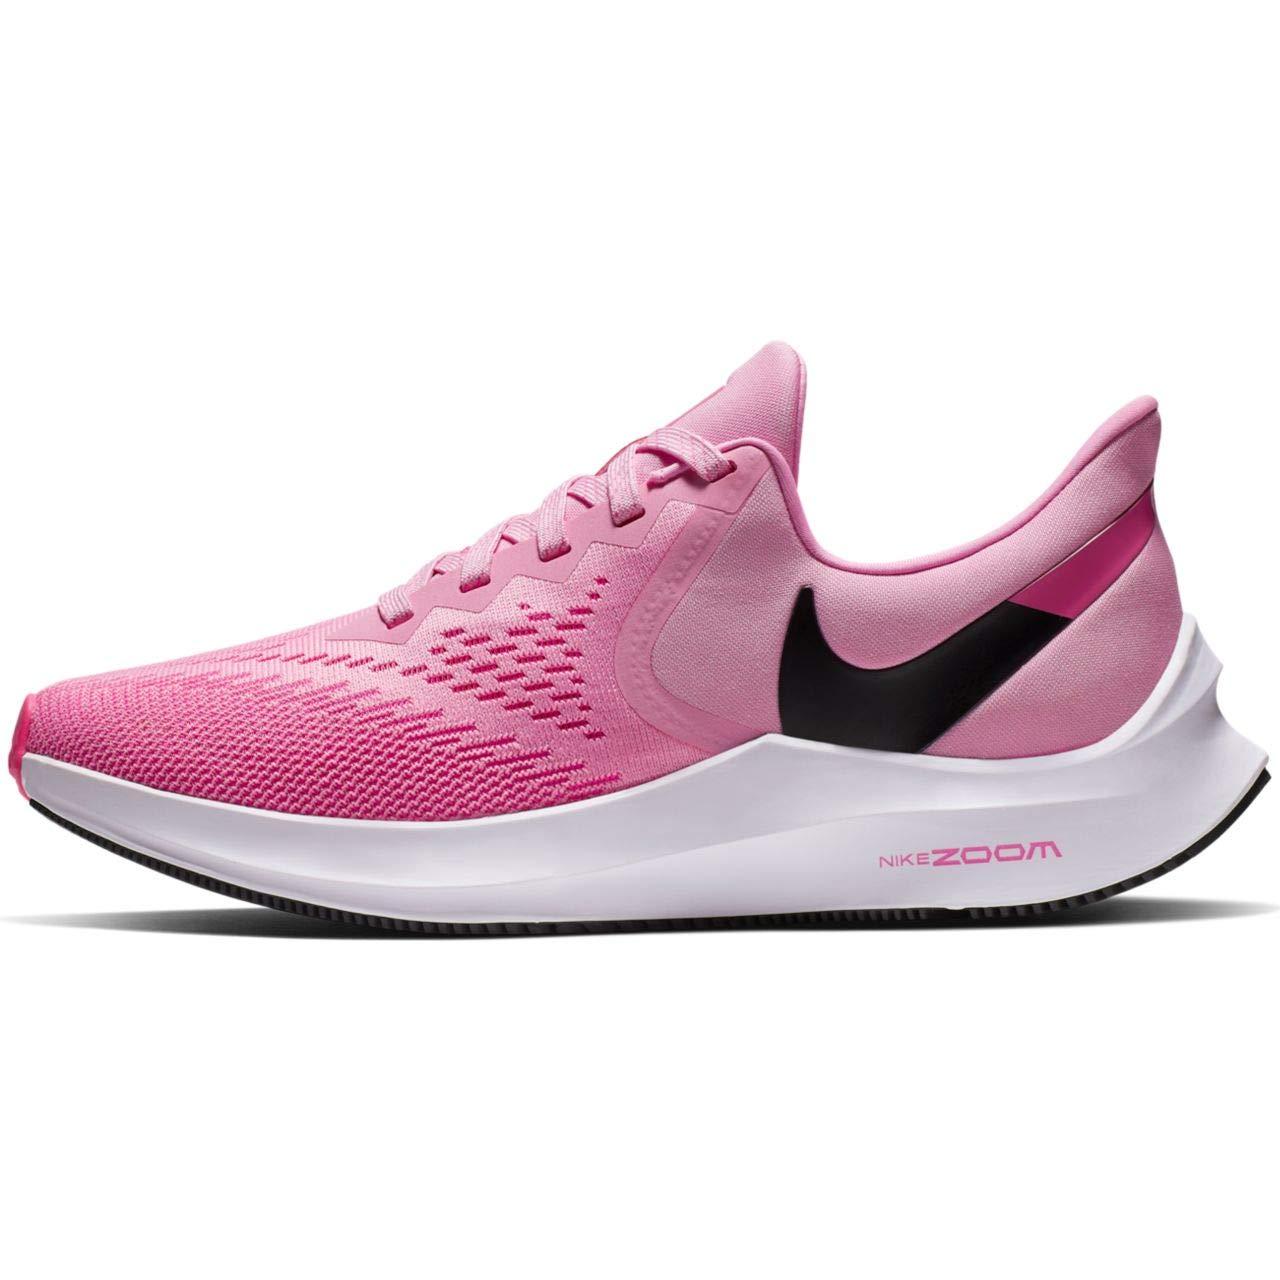 outlet store 05010 e6f5a Amazon.com   Nike Womens Zoom Winflo 6 Womens Aq8228-600 ...